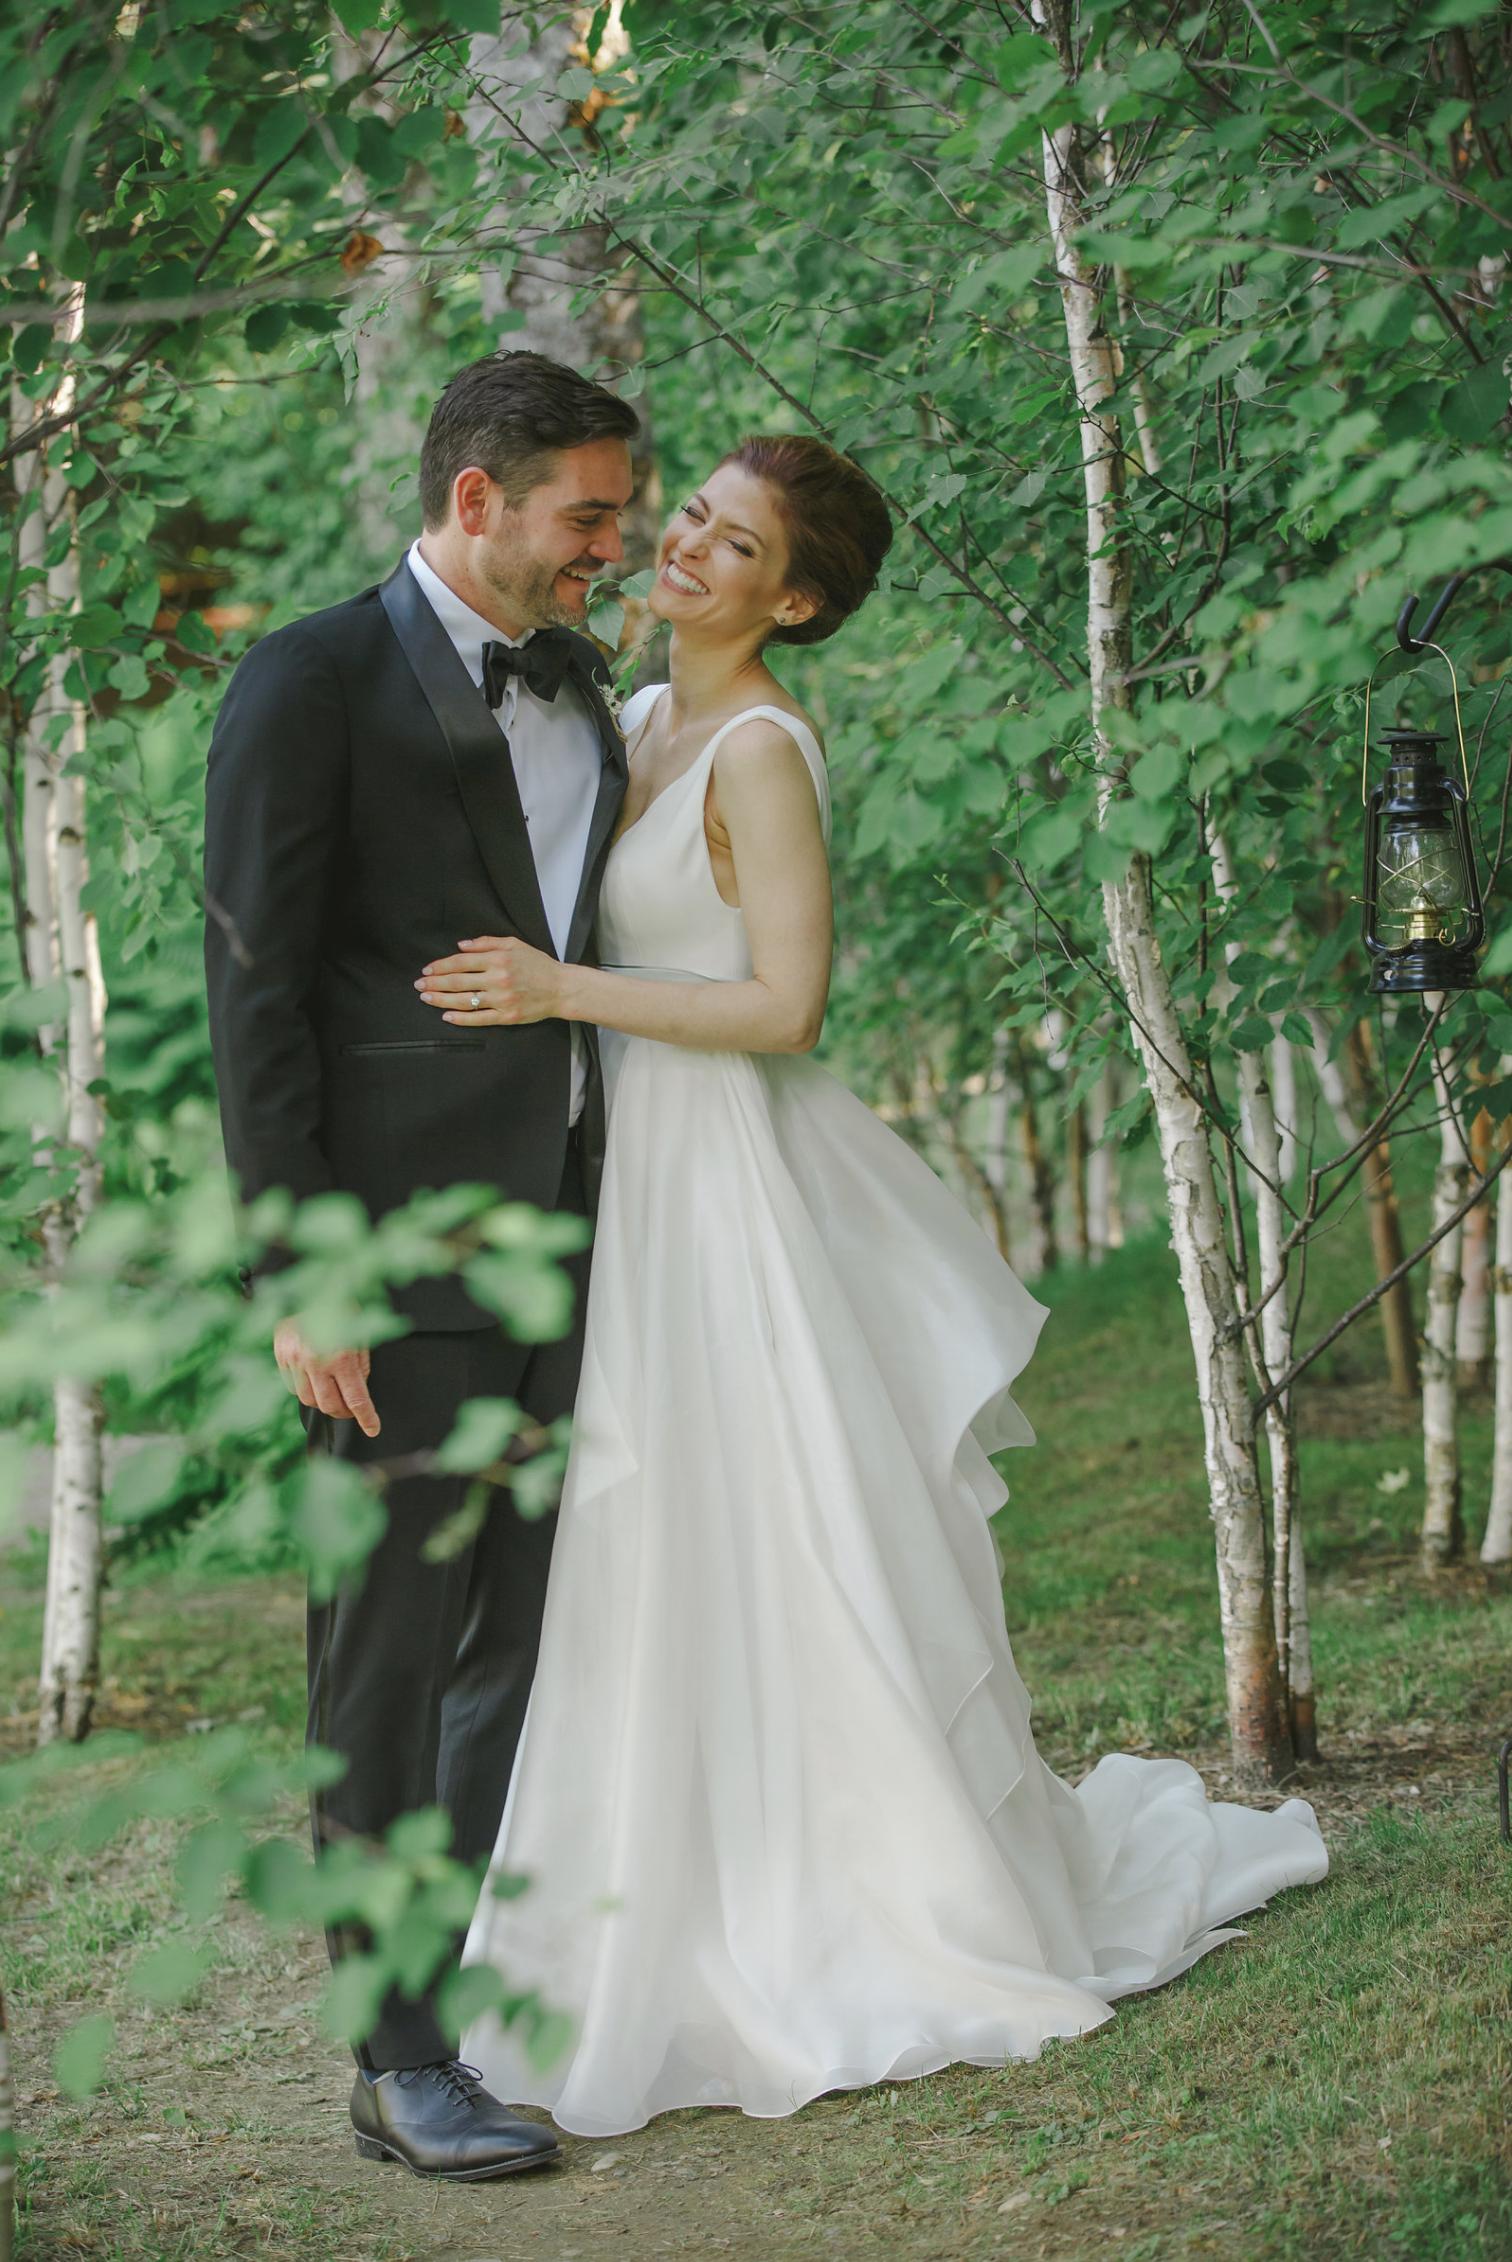 Carol Hannah Azurite Real Wedding Bridget+Tyler10.png